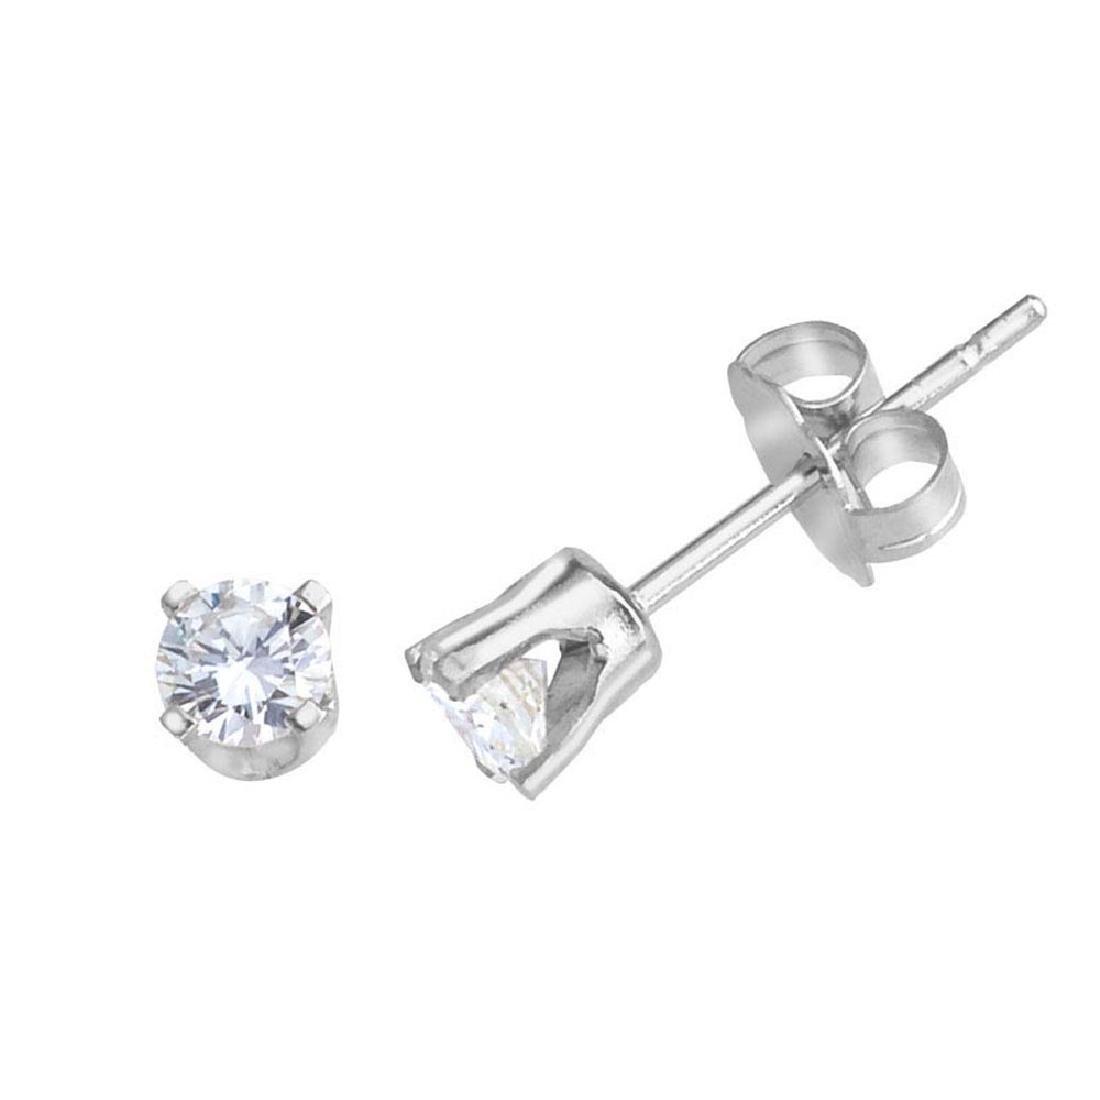 Certified 14k White Gold 0.20 Ct Diamond Stud Earrings